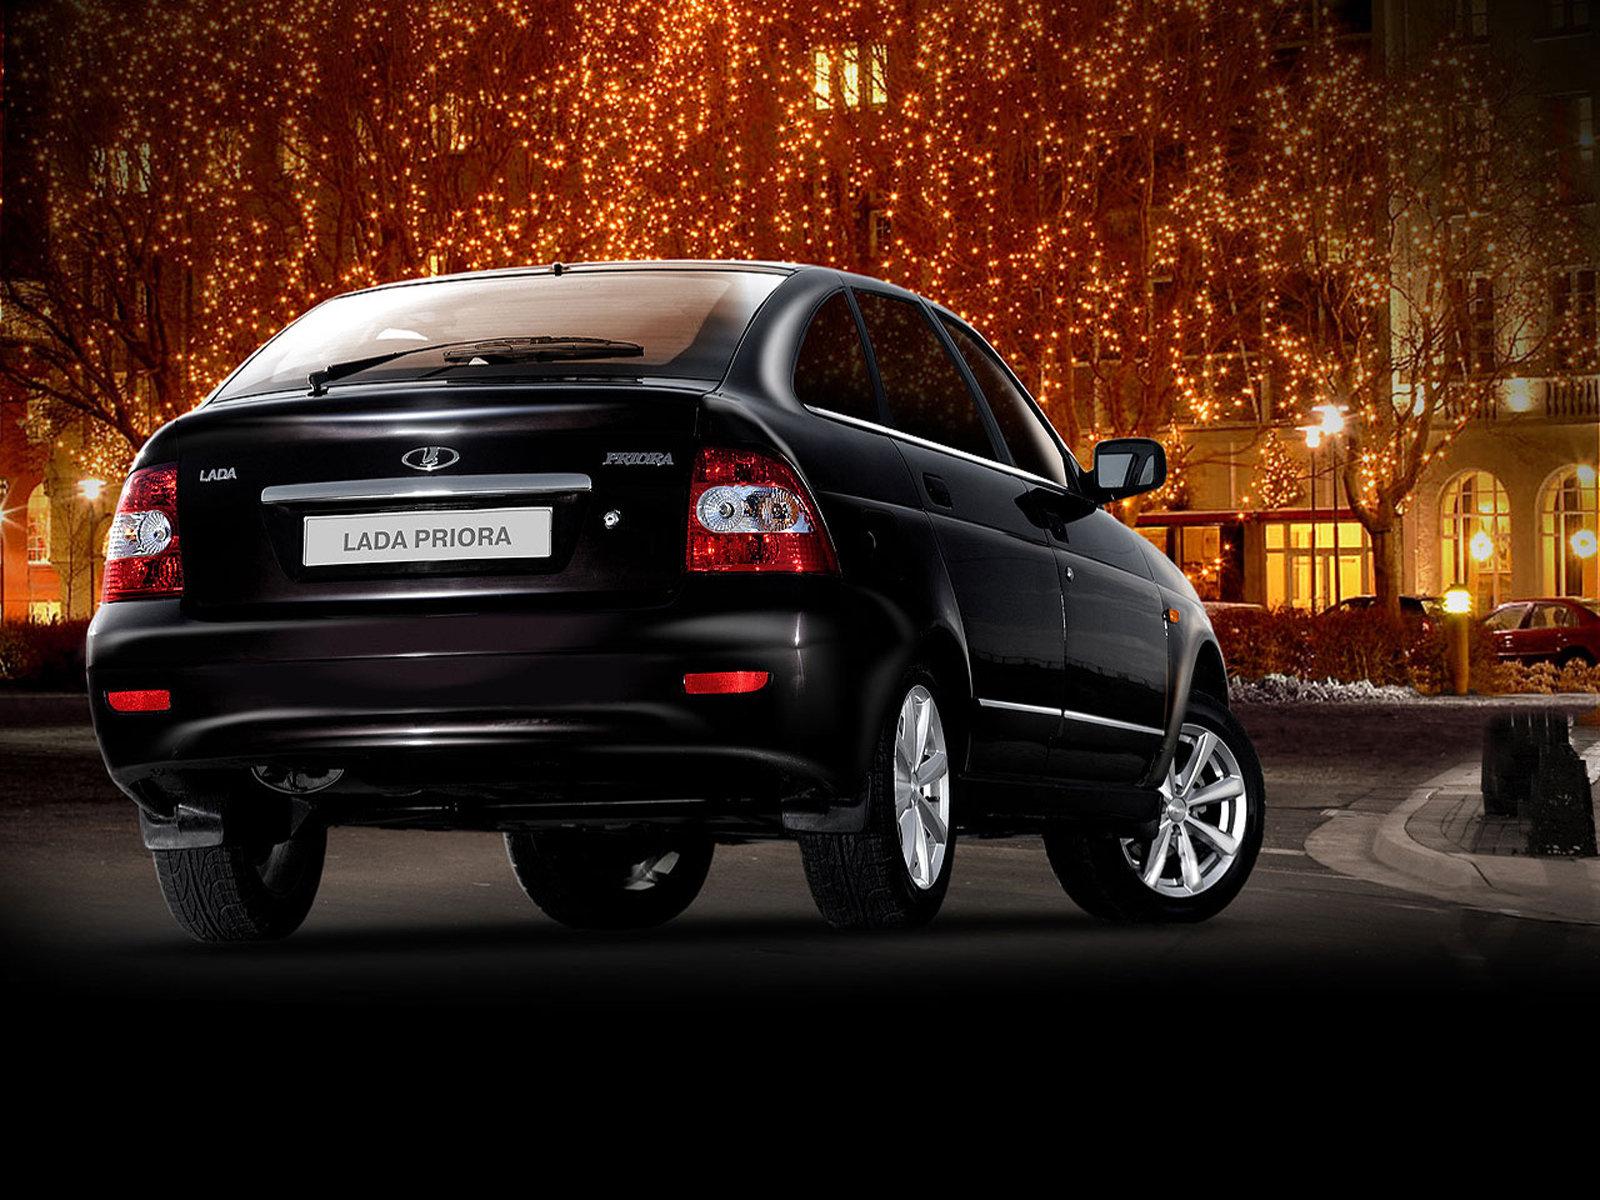 Lada Priora Hatchback 2012. Лада Приора Хэтчбек 2012).